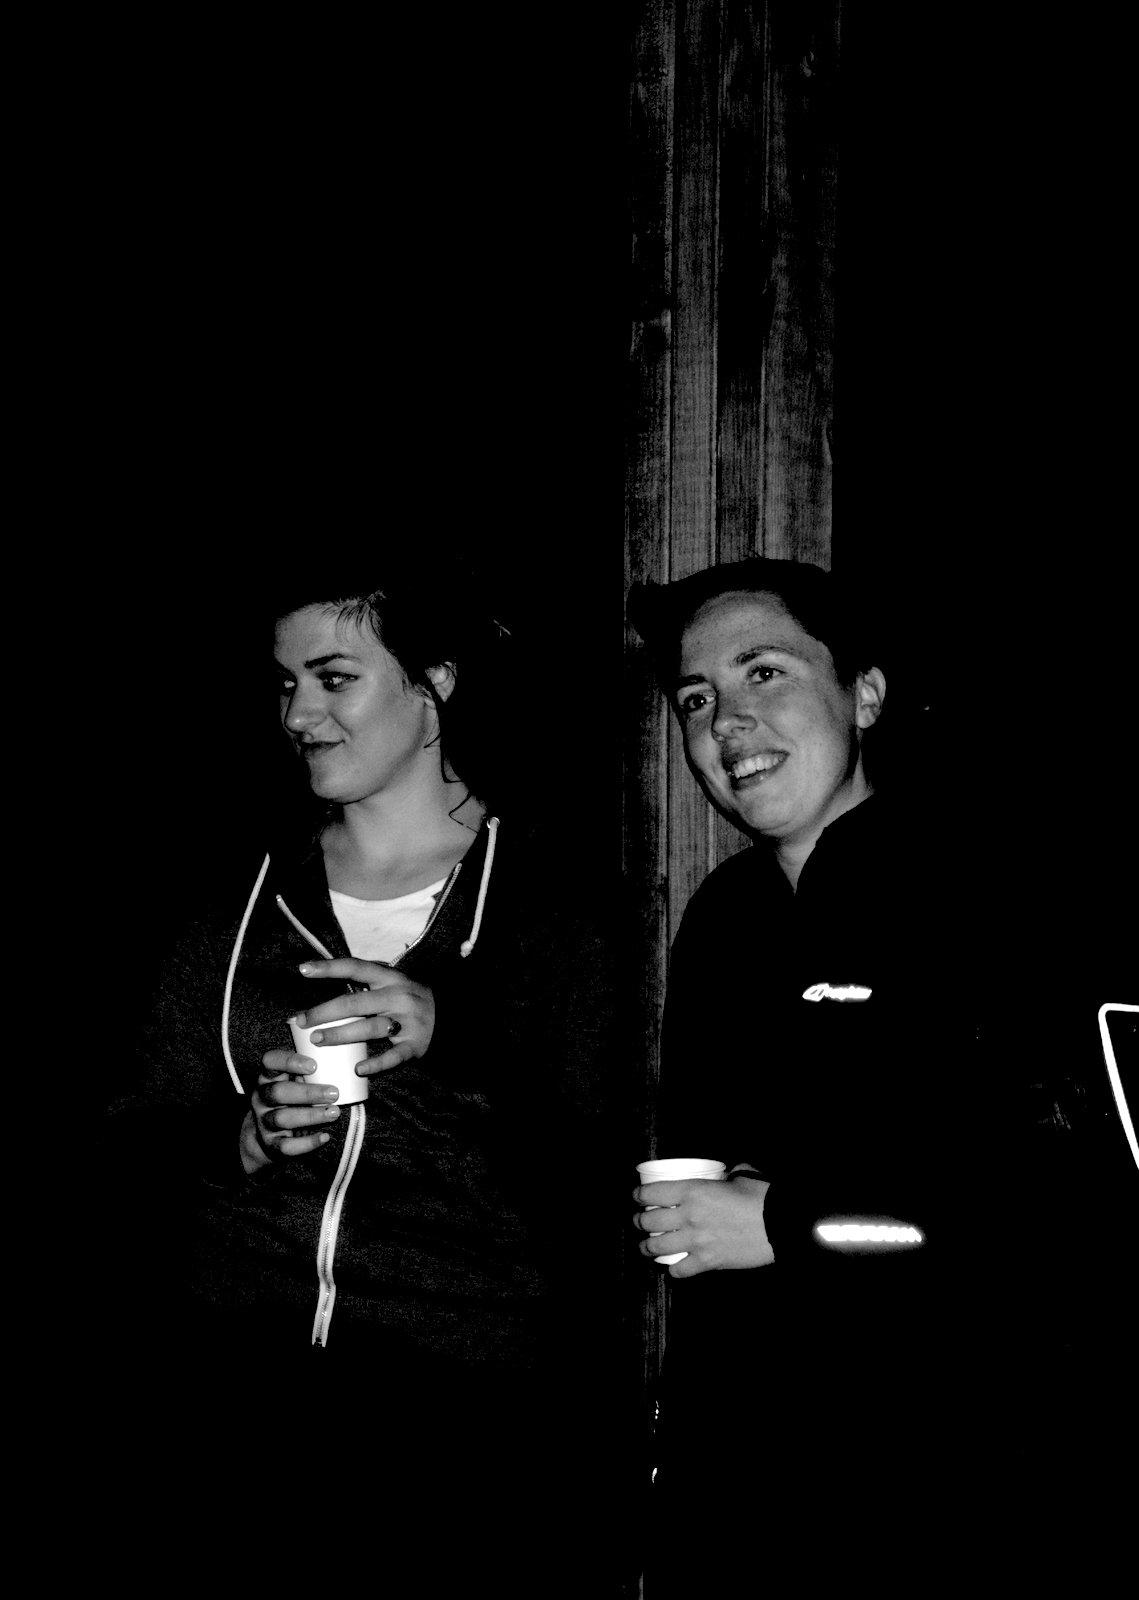 Run 1692 | 4th November 2015 | Aristokat & Sweaty Box @ Clifton Hill for Guy Fawkes Night